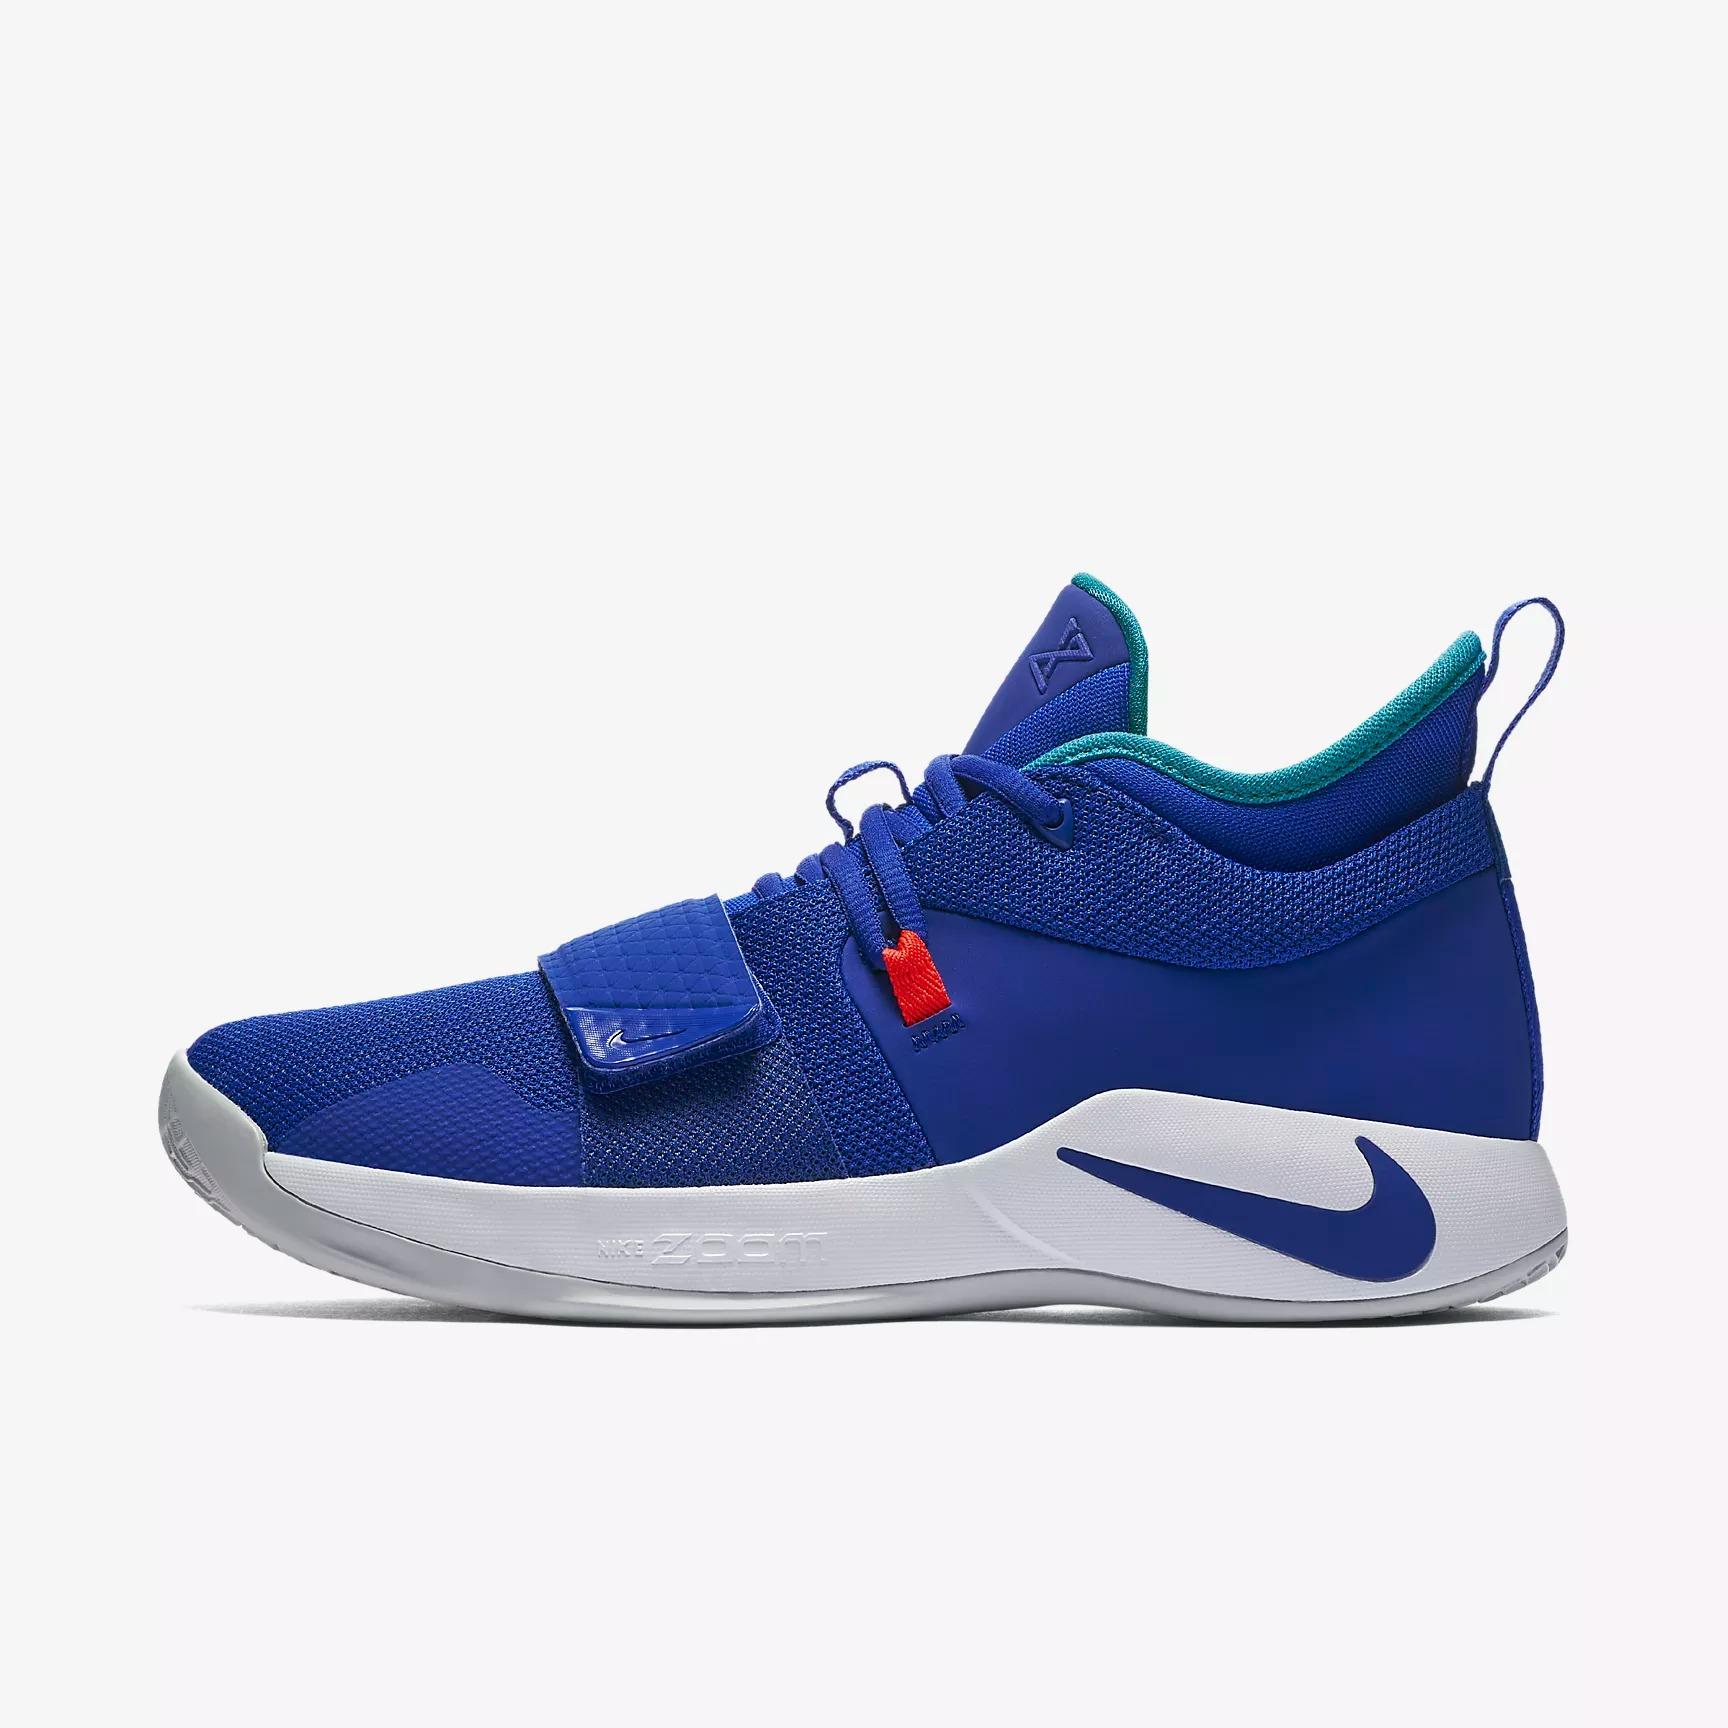 359efcc0e01c ... Nike Pg  Nike PG 2.5 Fortnite Basketball Shoes